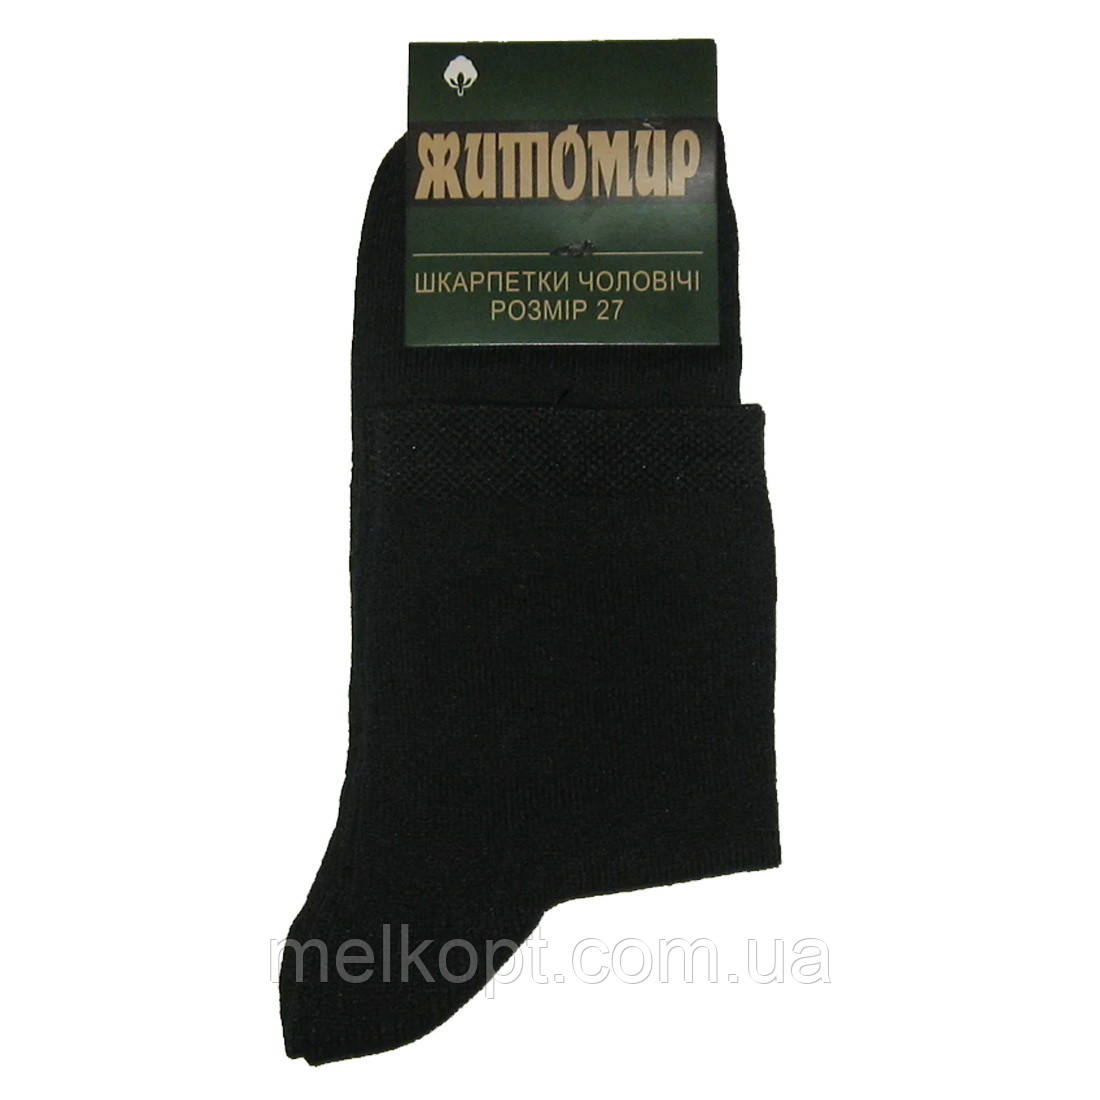 Мужские носки Житомир - 7,50 грн./пара (Elite)